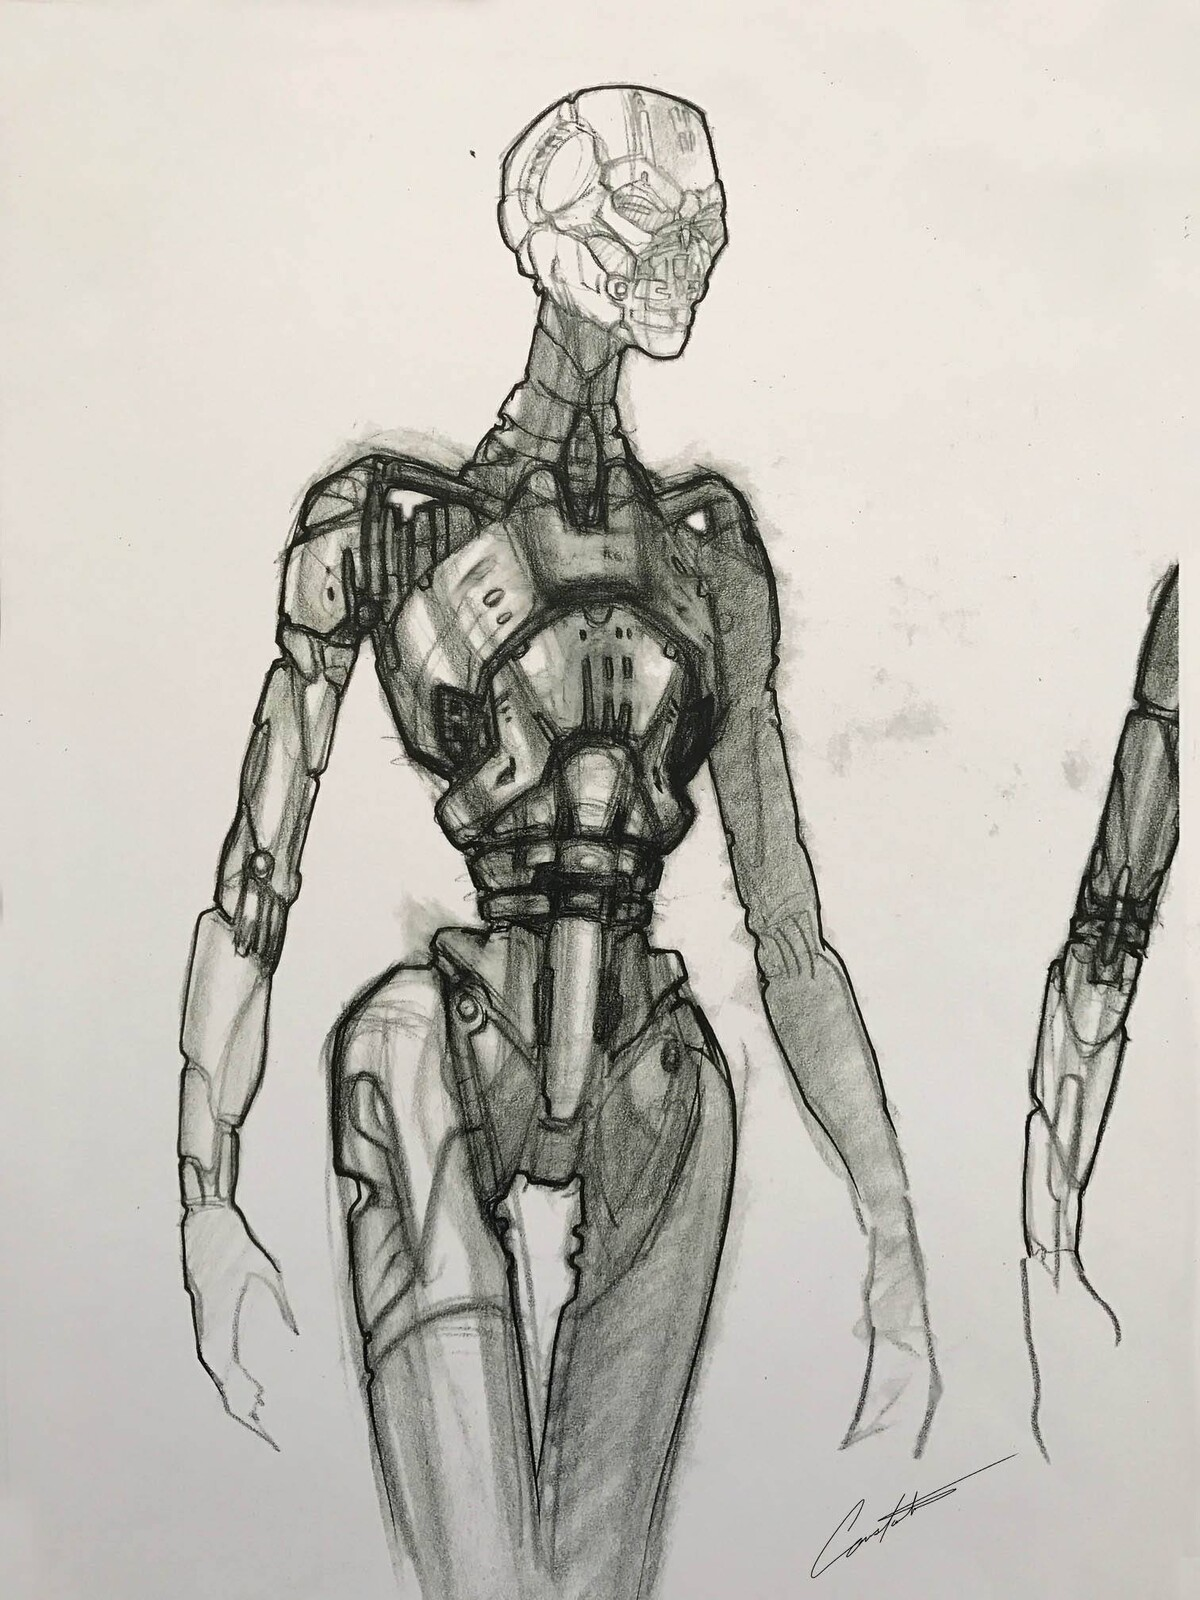 Terminator 3 exploration design sketch